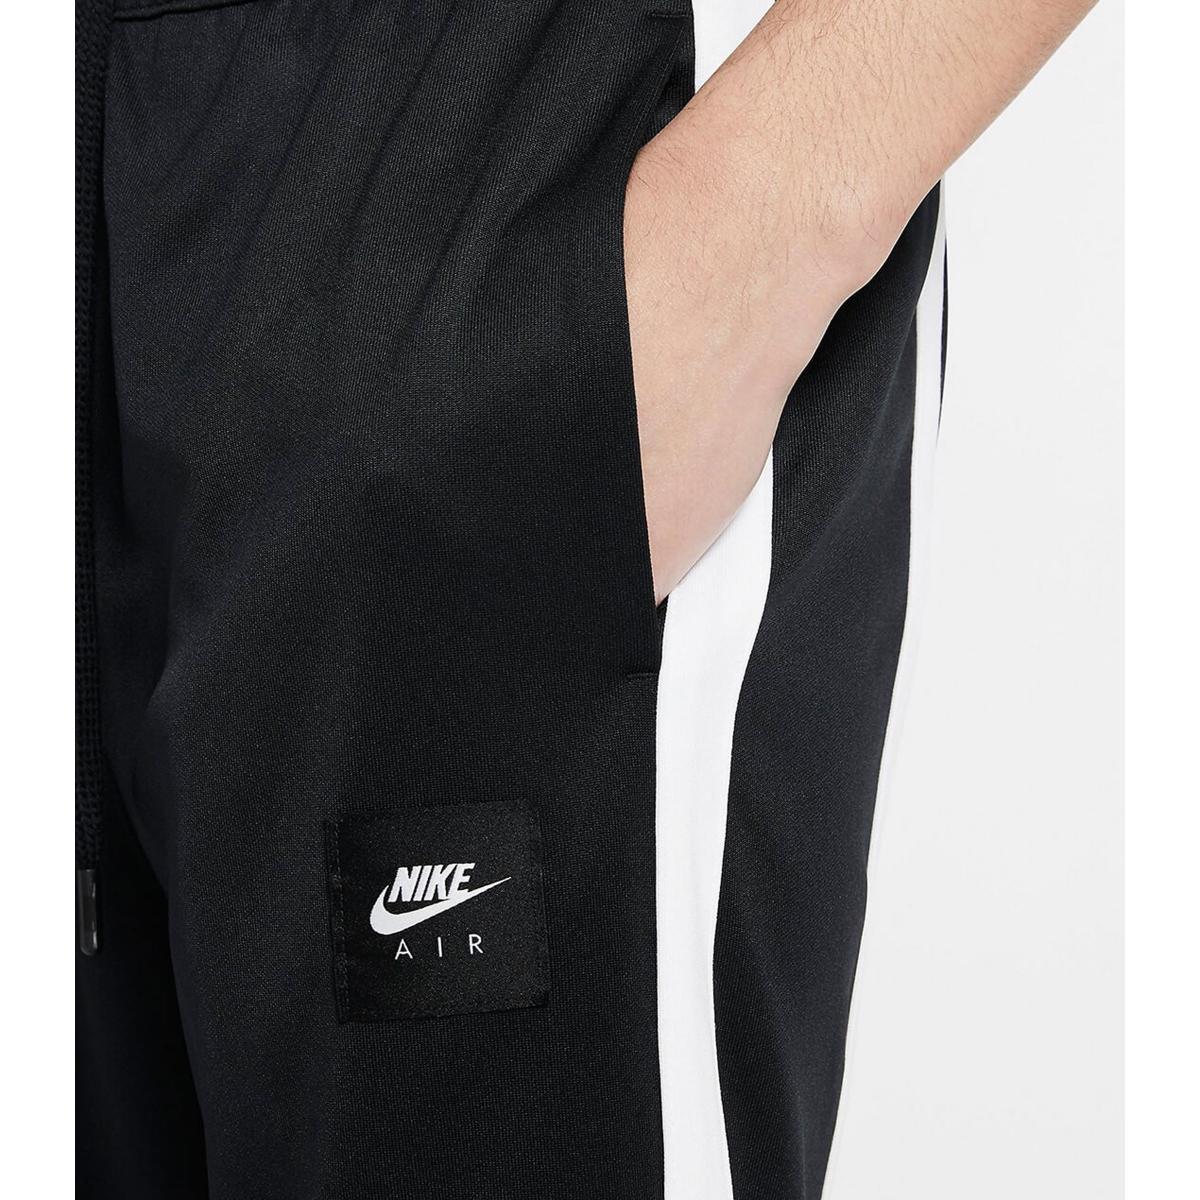 Pantaloni Nike Air con bande laterali da uomo rif. BV5151-010